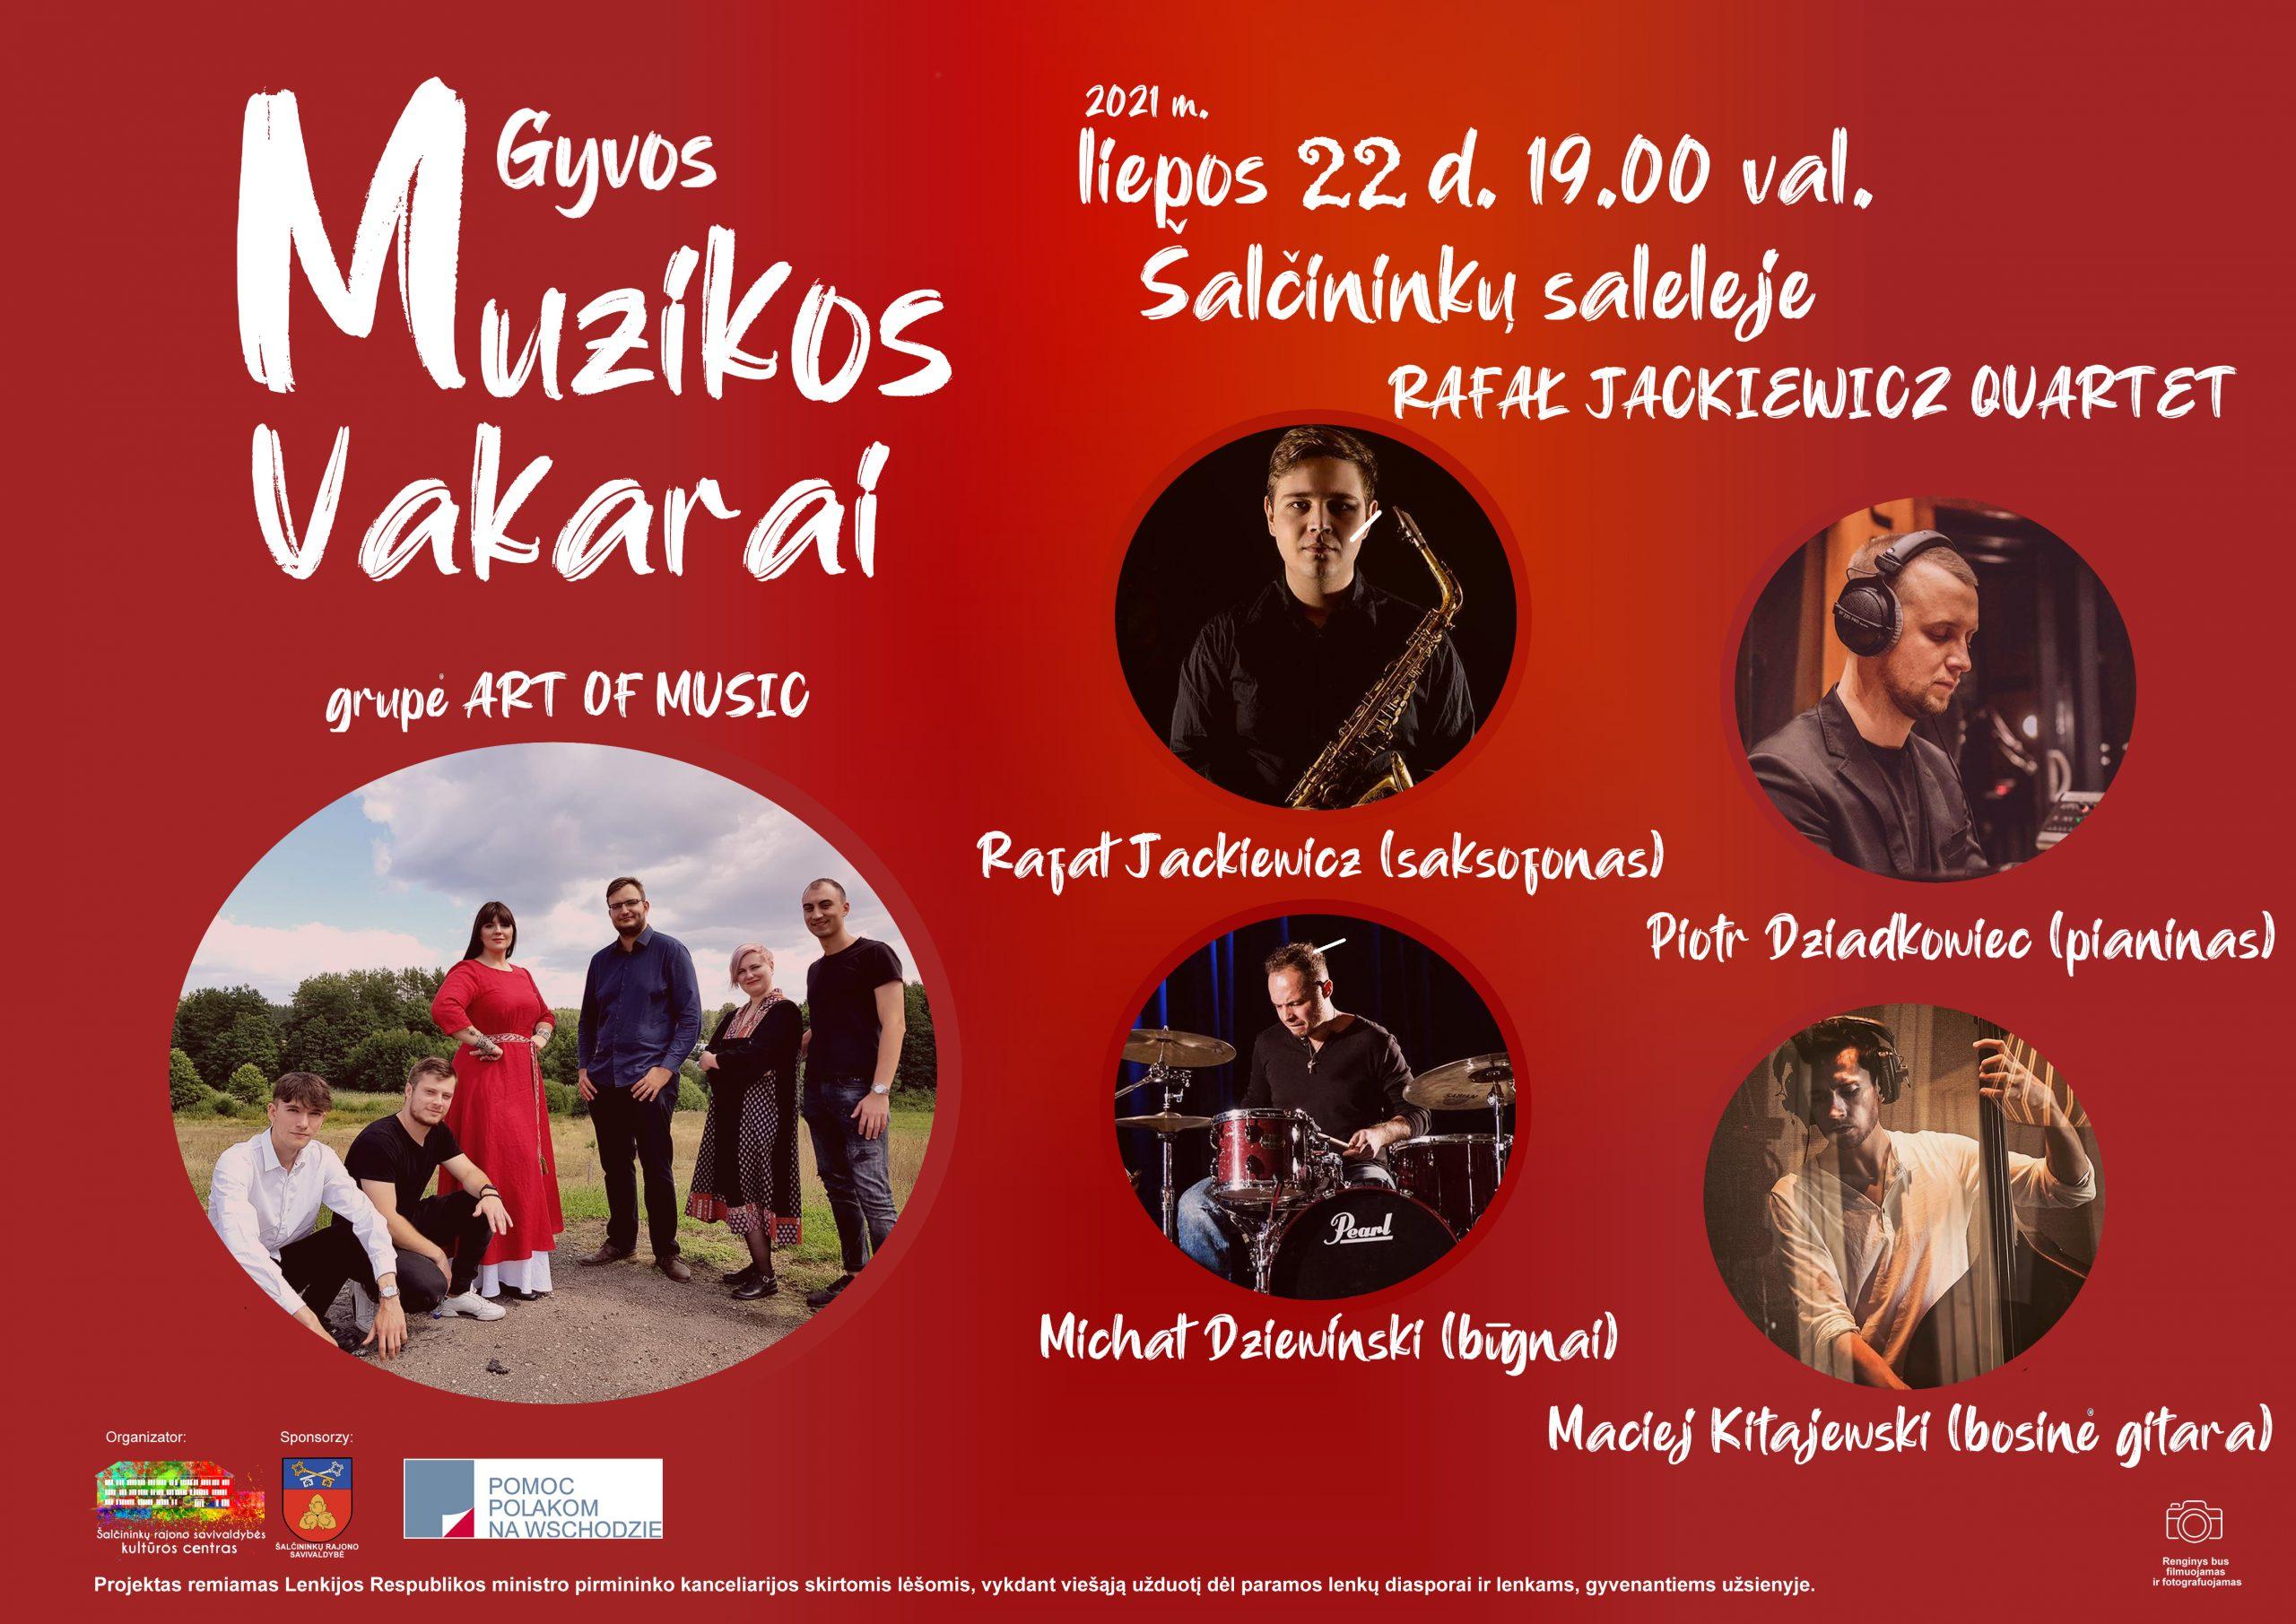 You are currently viewing GYVOS MUZIKOS VAKARAI